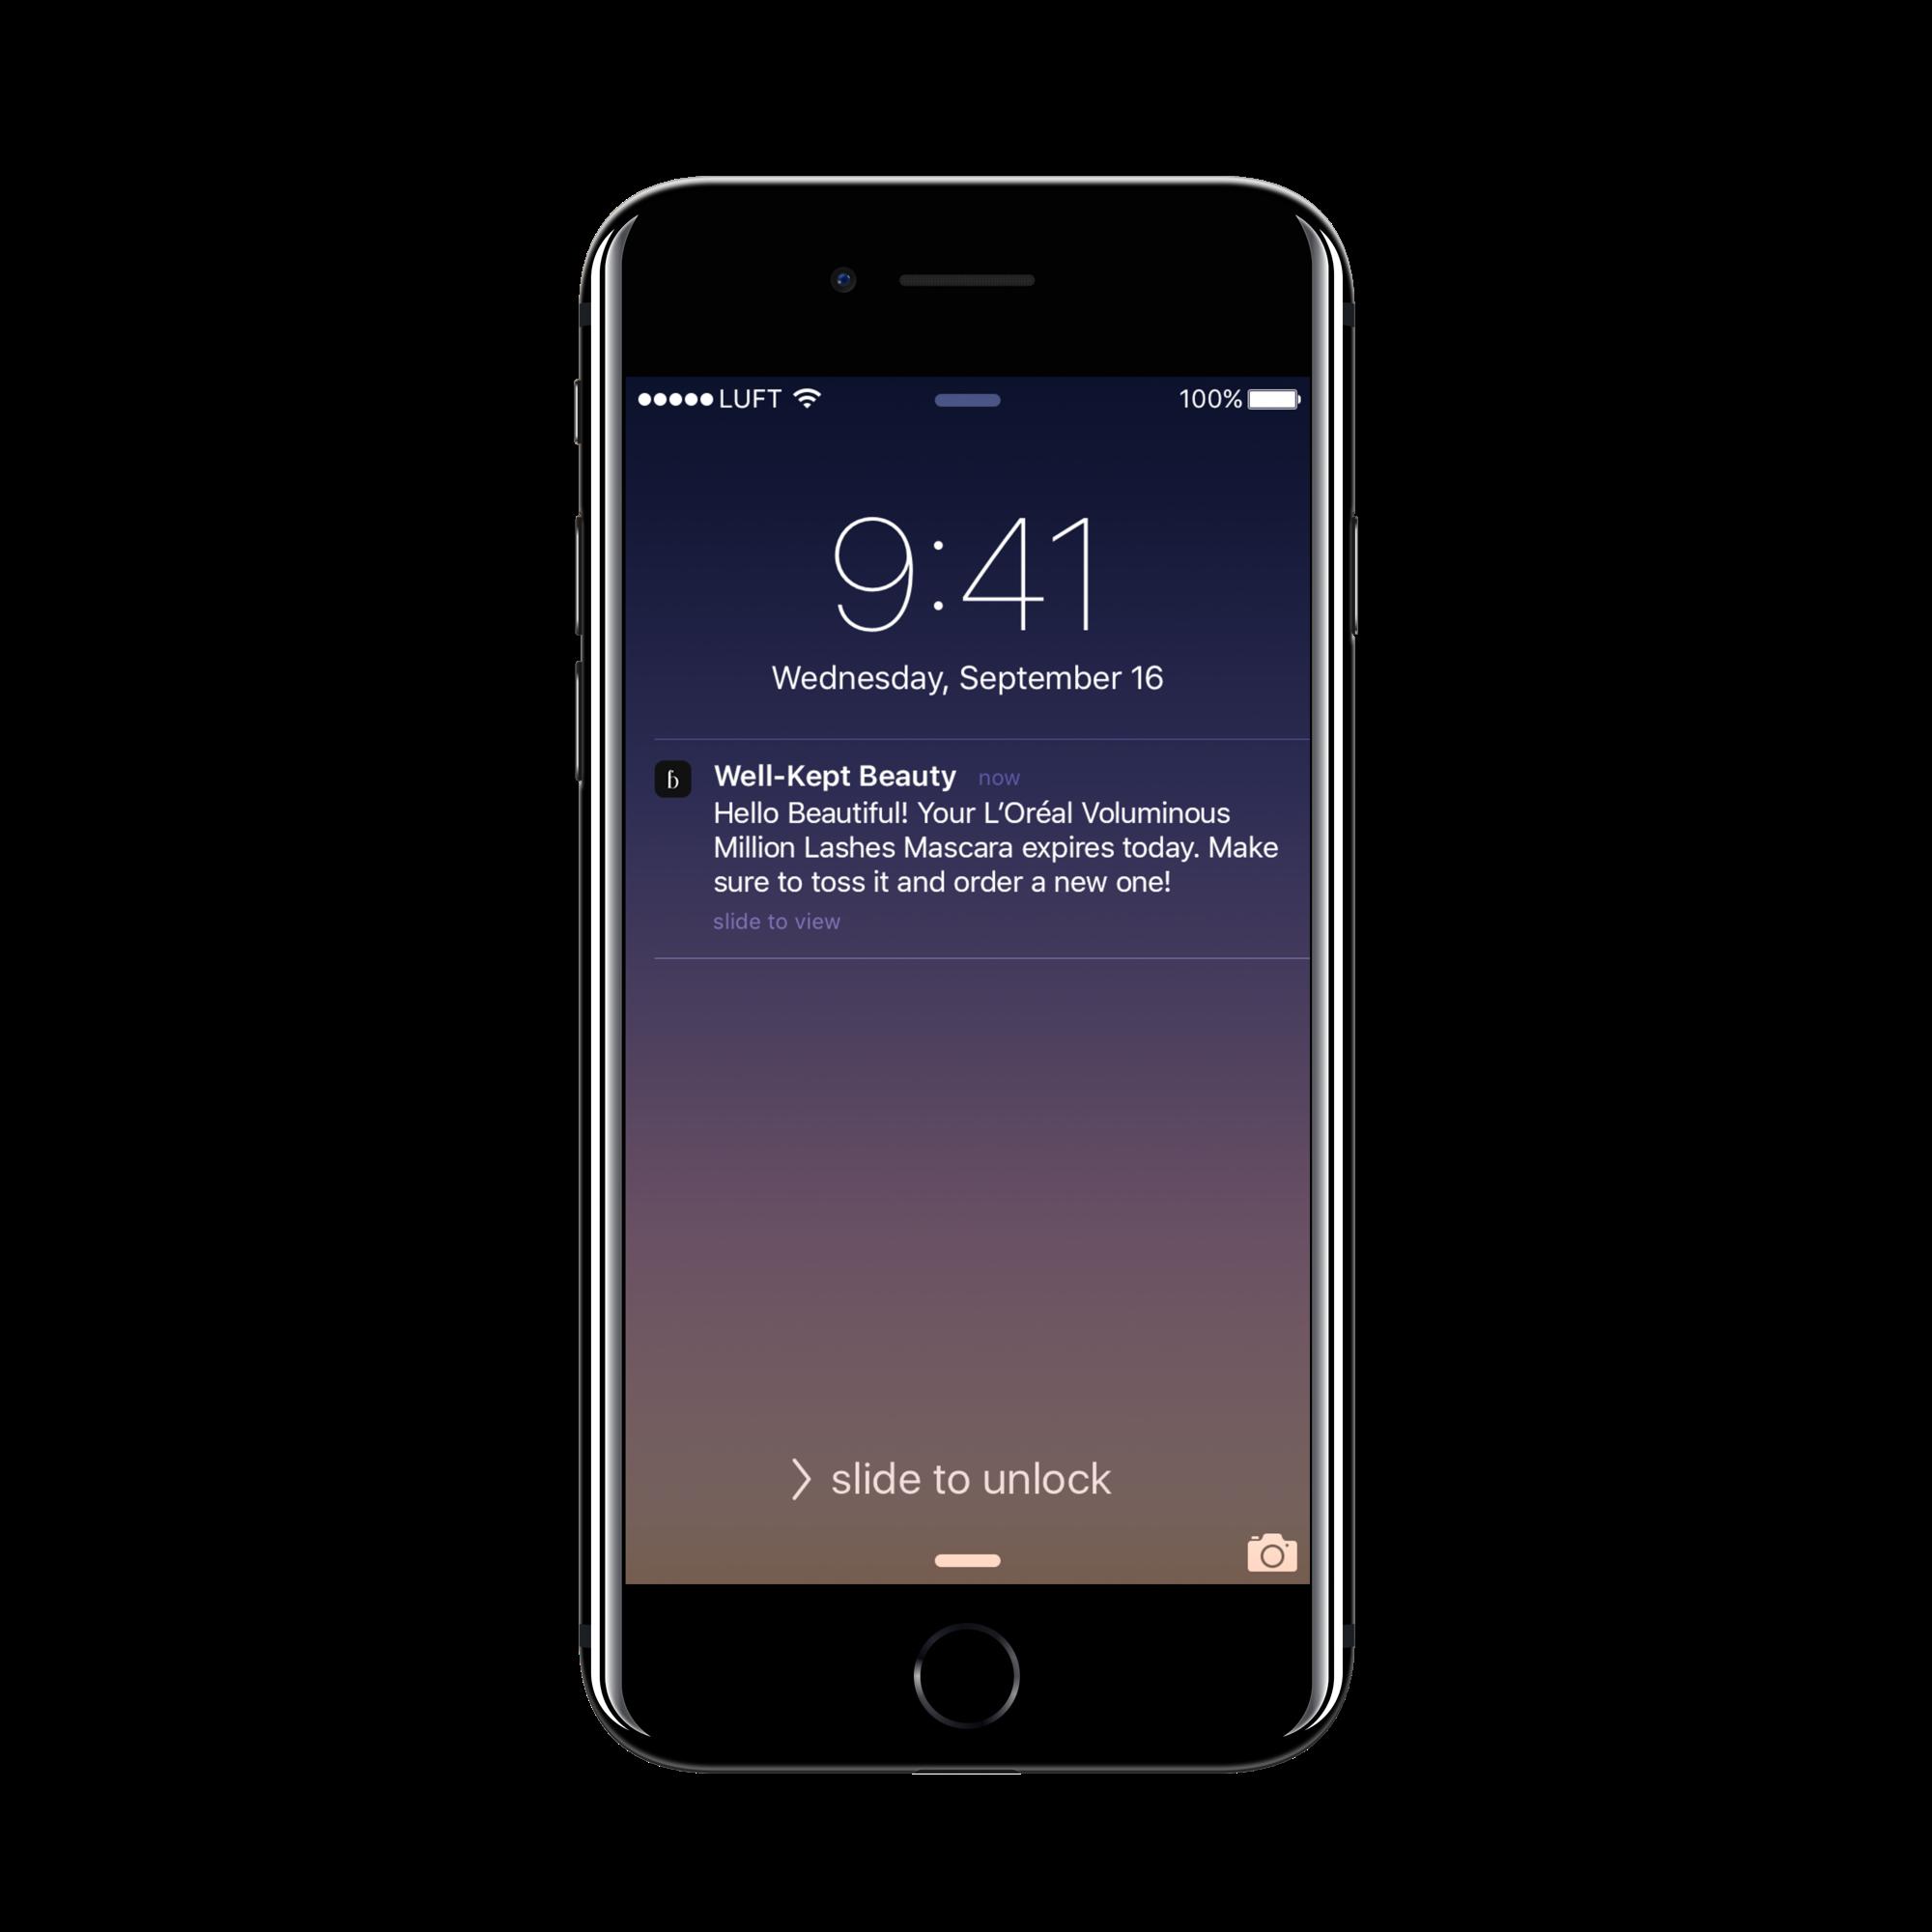 11a_push-notification_preview_iphone7plusjetblack_portrait.png